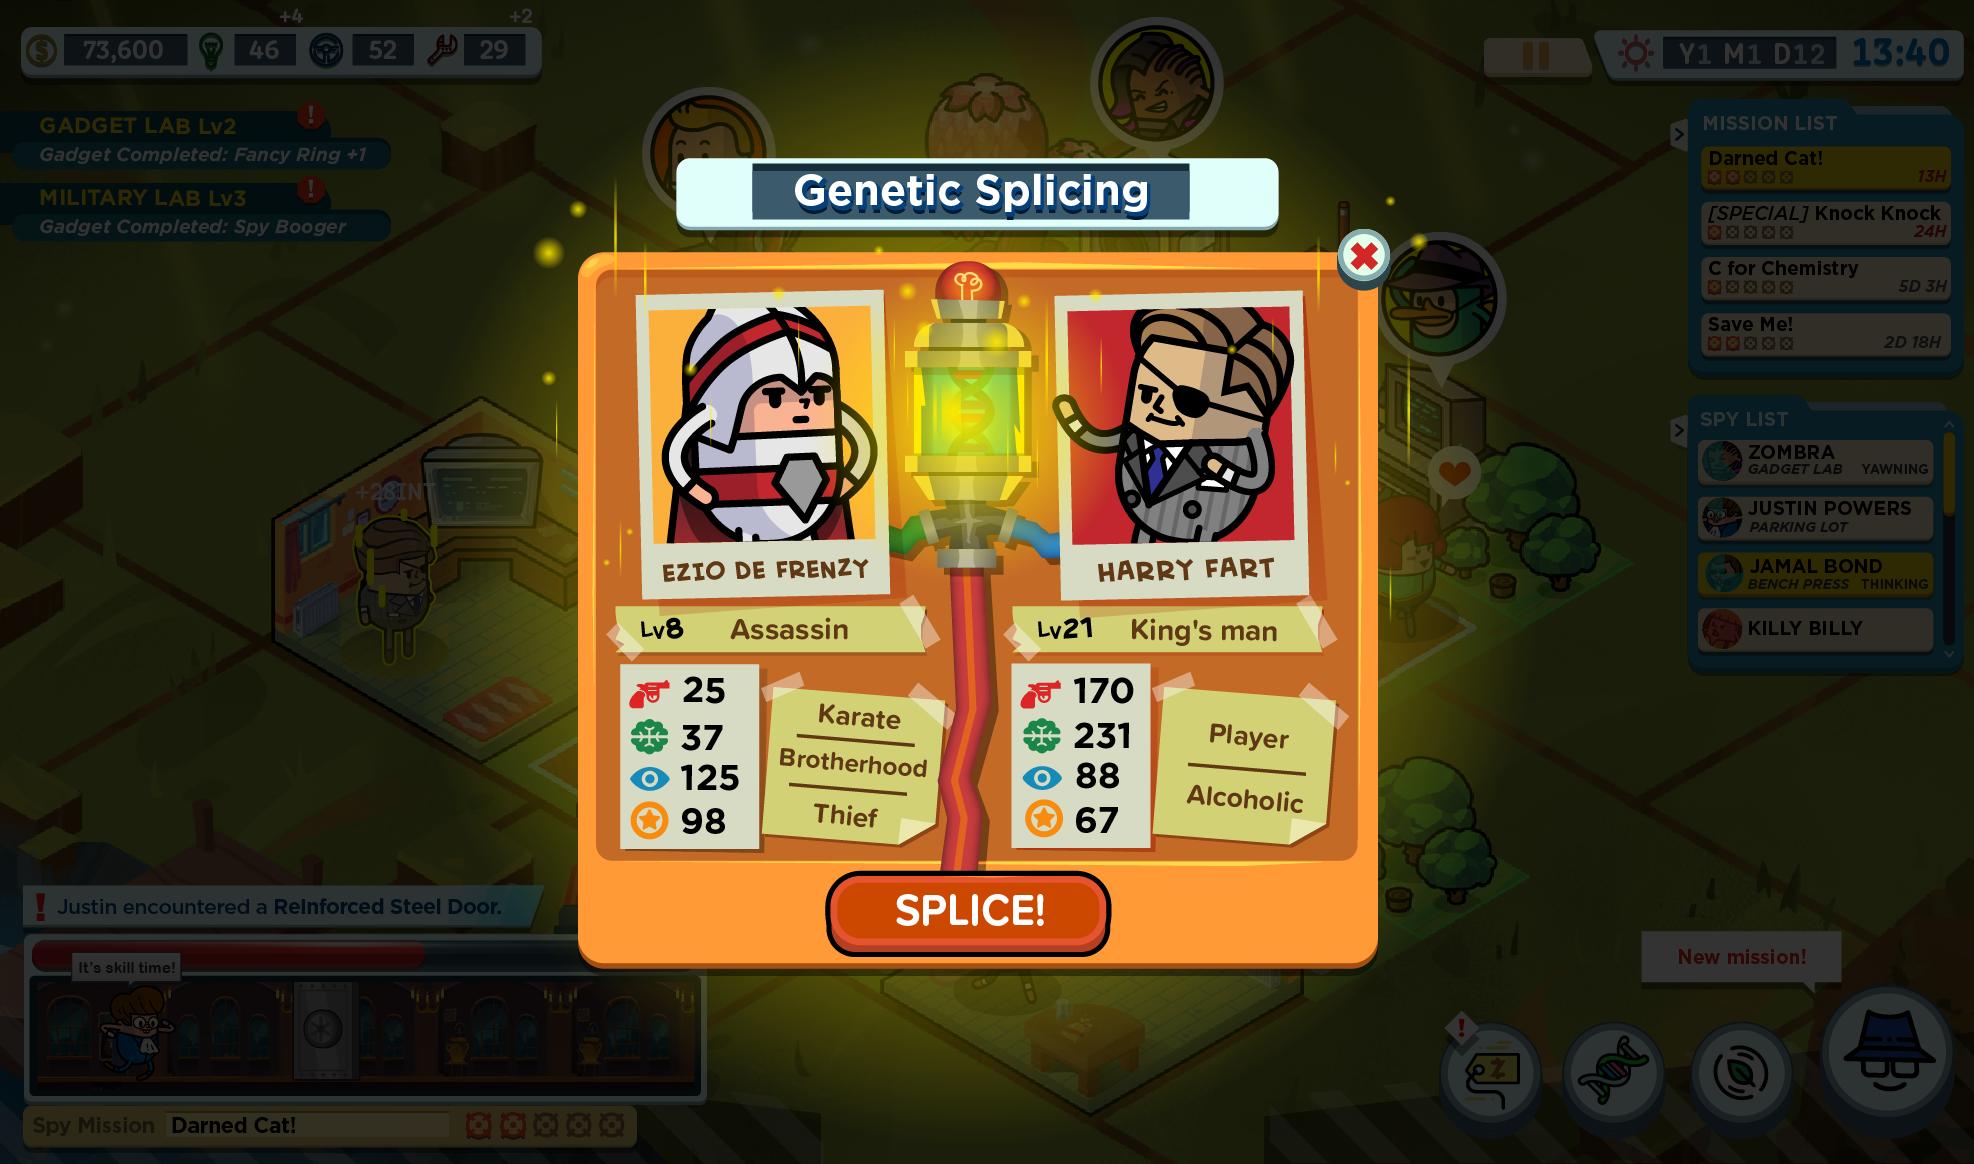 Genetic Splicing